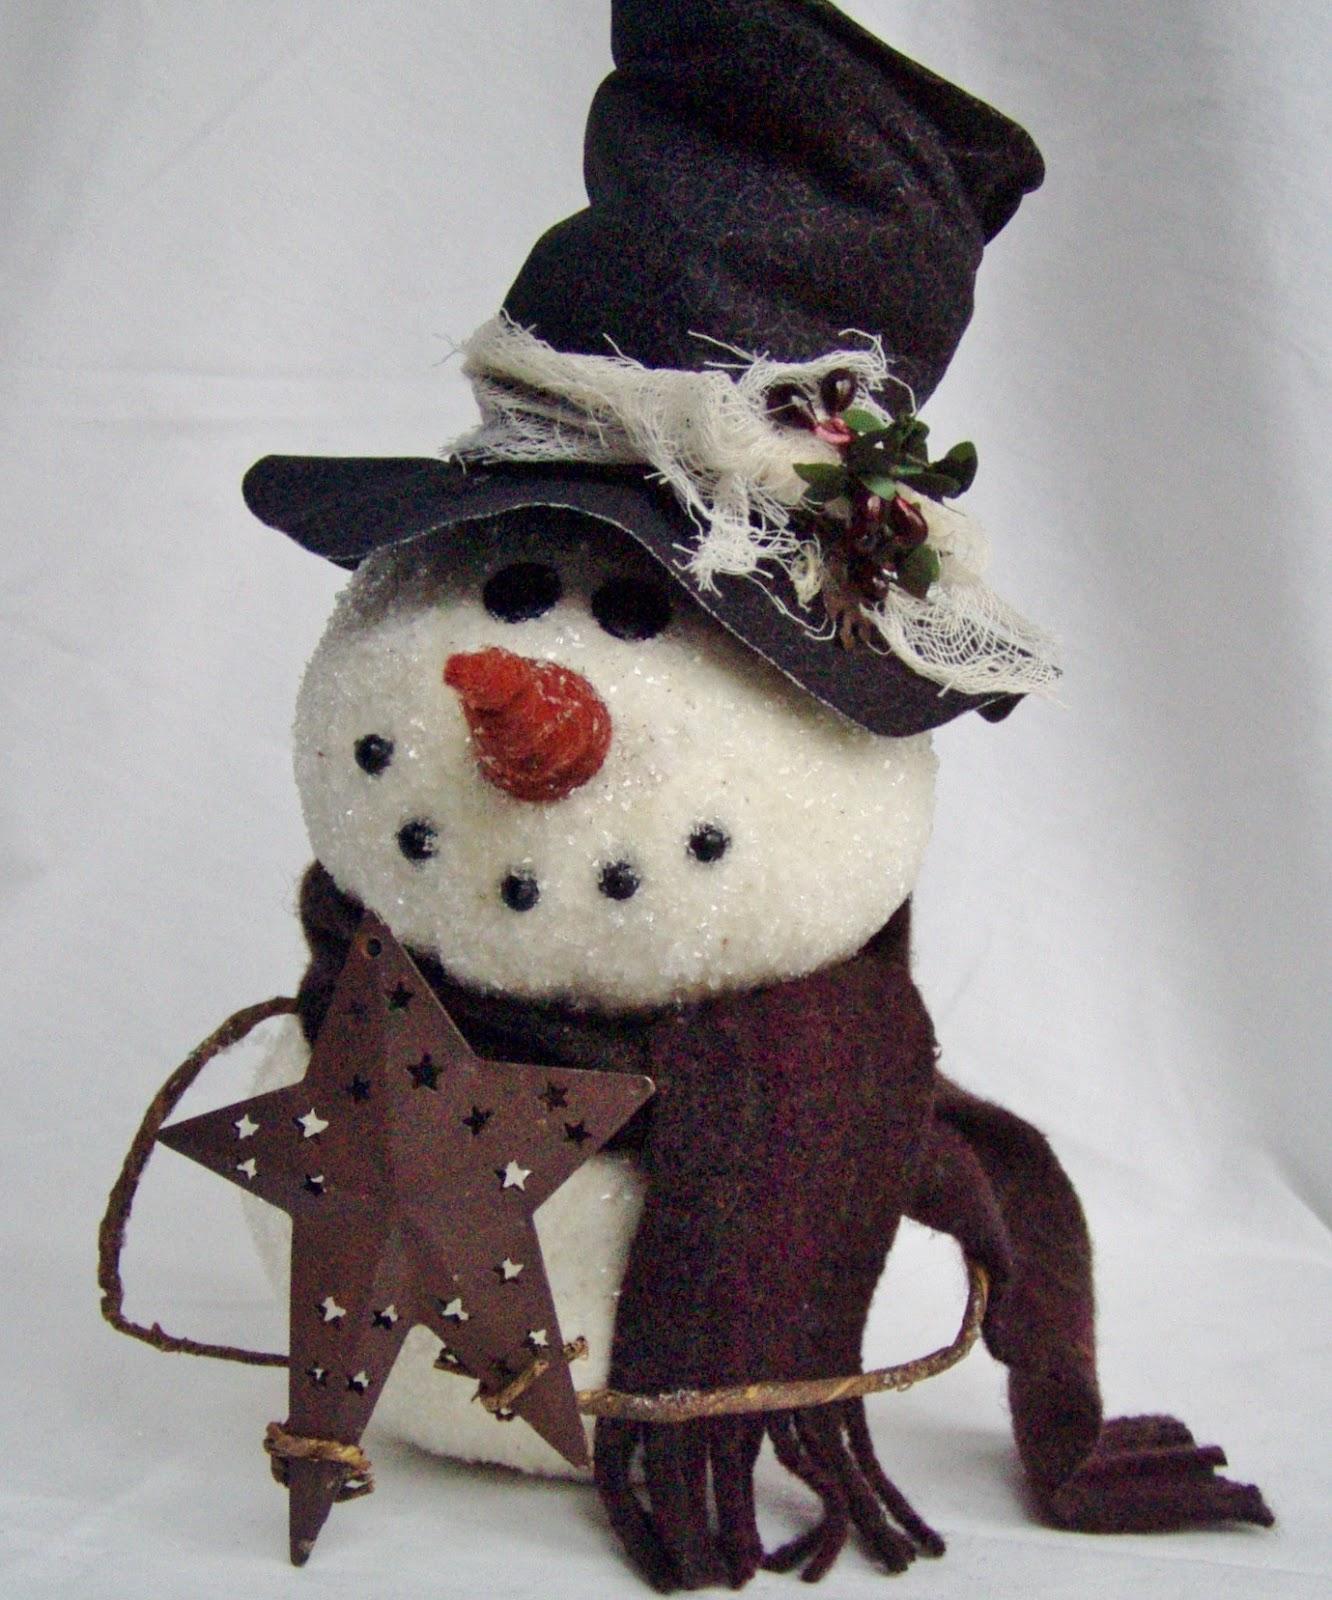 happy valley primitives a new epattern meet my snowman. Black Bedroom Furniture Sets. Home Design Ideas